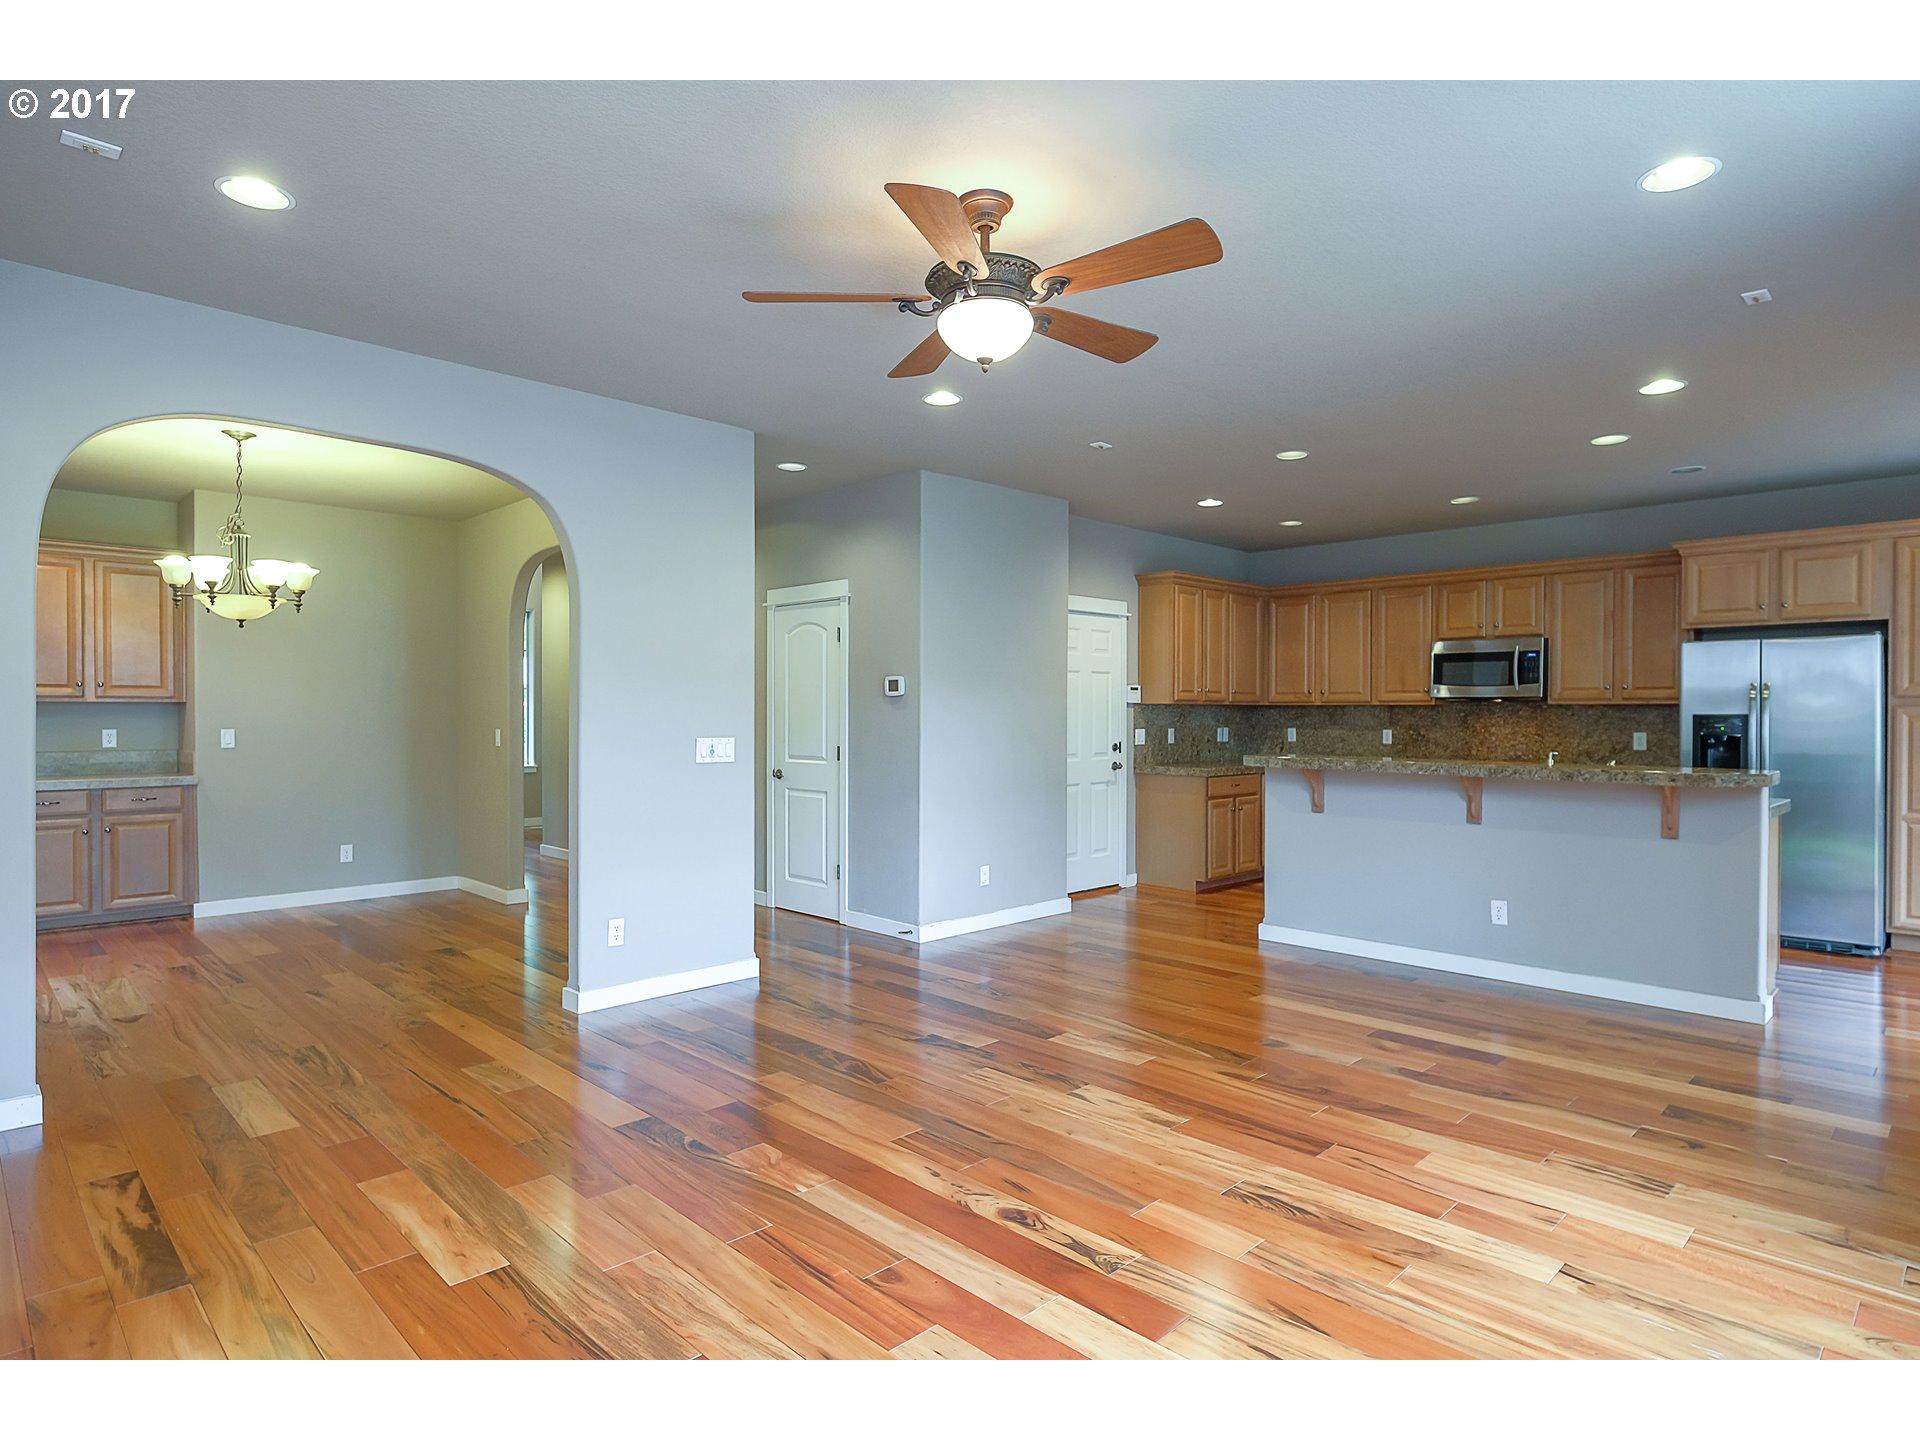 6146 NE RIDGESTONE CT Hillsboro, OR 97124 - MLS #: 17211481